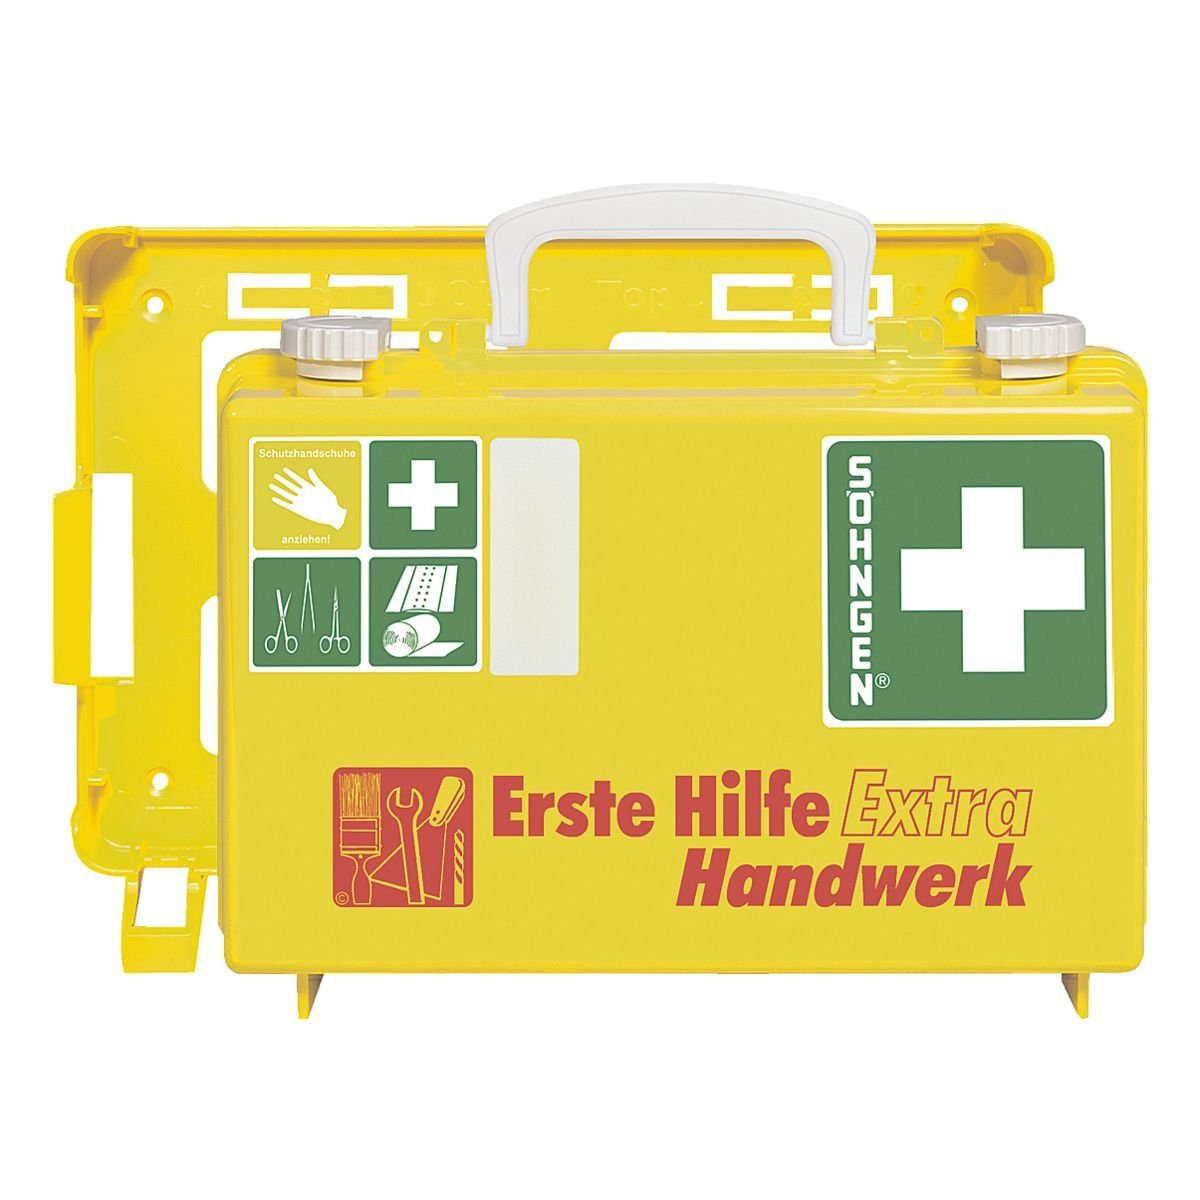 SOEHNGEN Erste Hilfe Koffer »extra HANDWERK QUICK-CD«